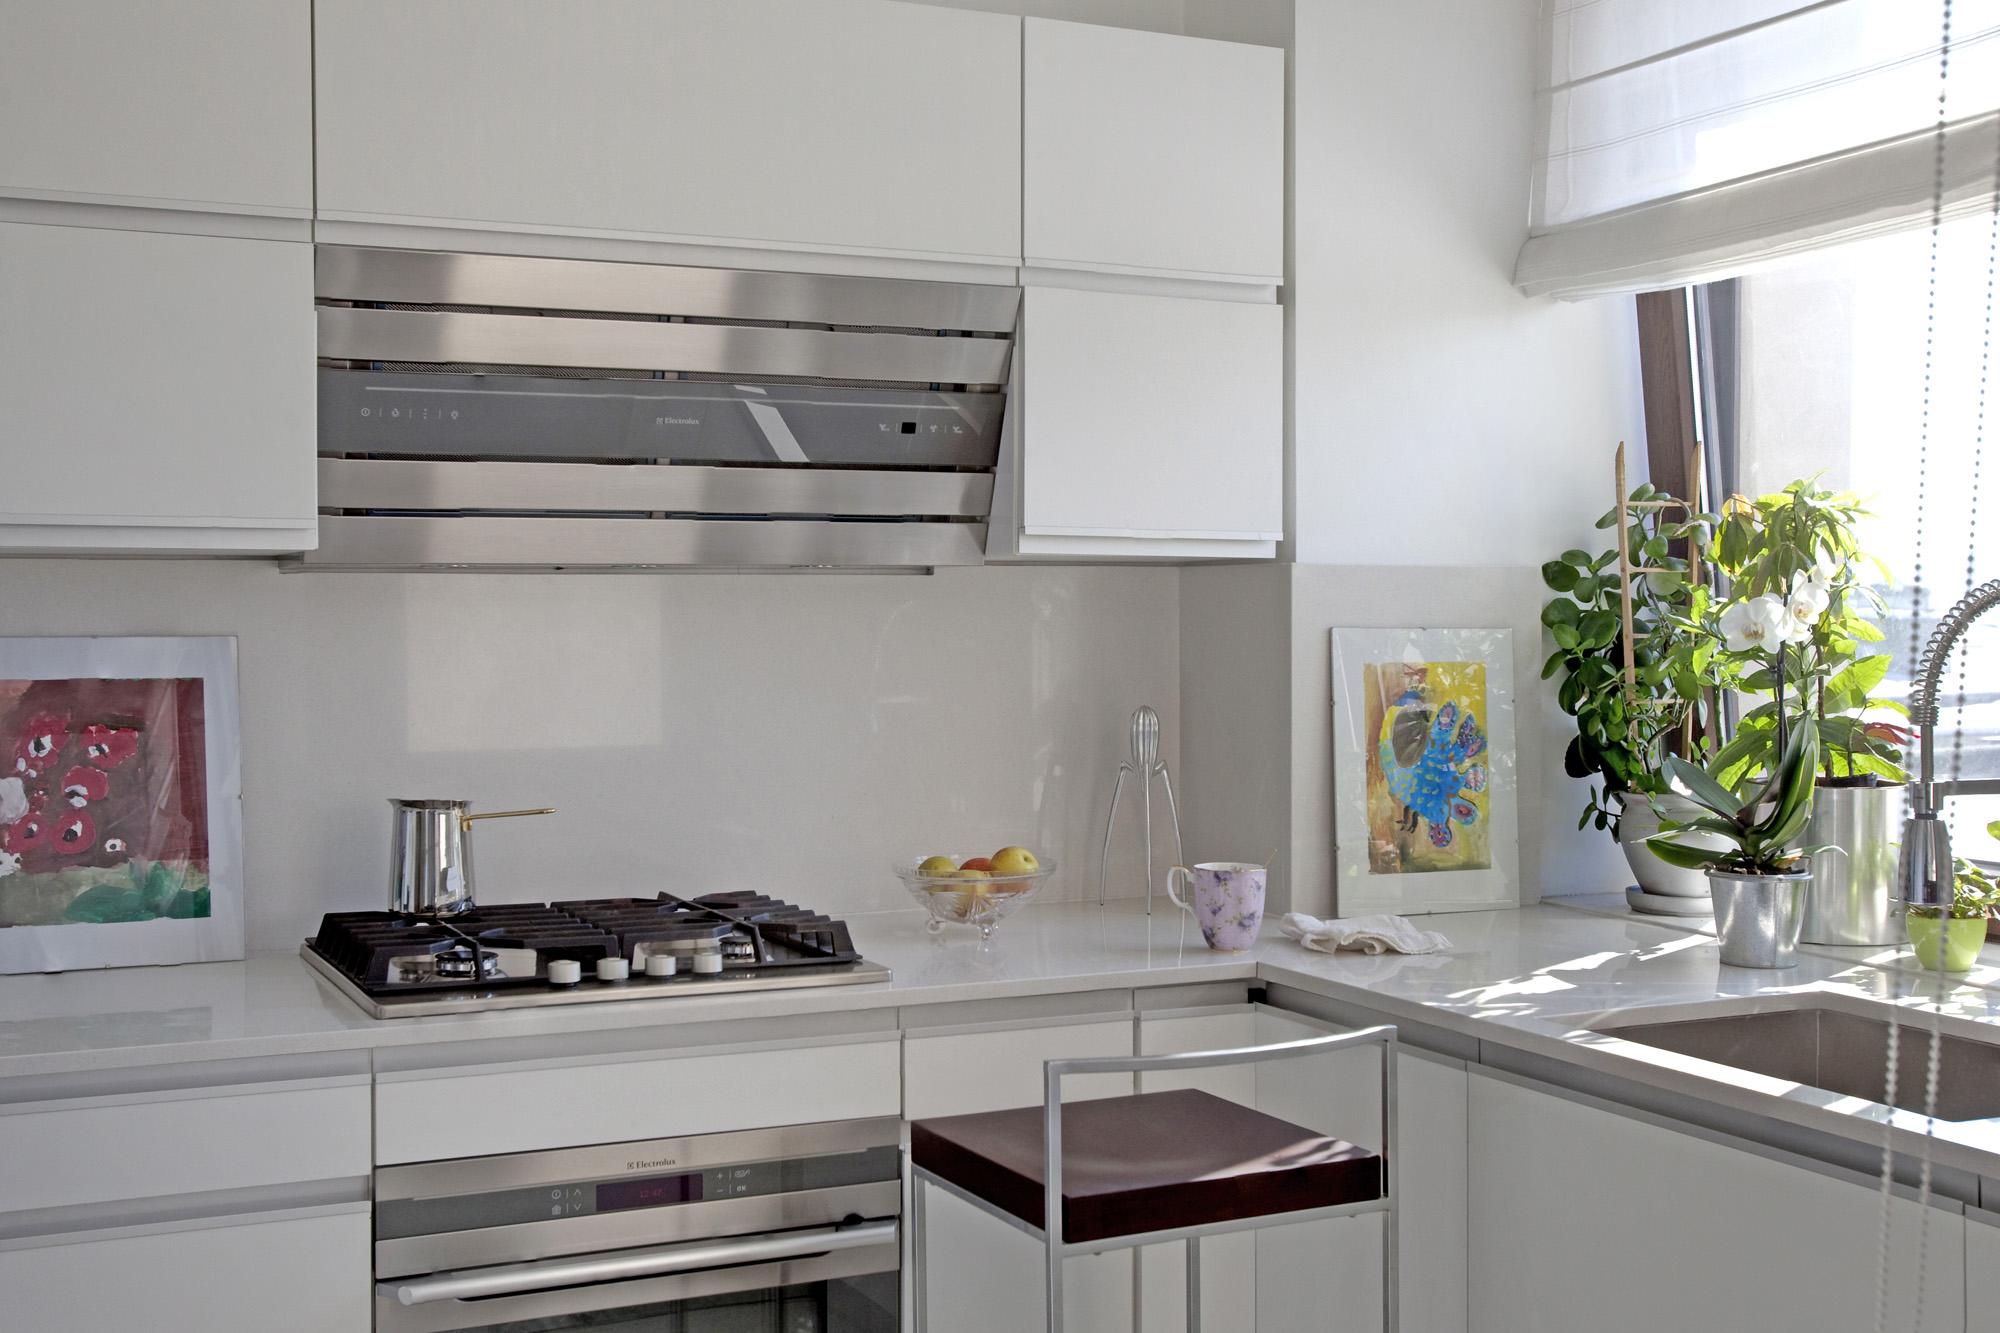 https://ahe-ro.s3.amazonaws.com/12329/apartament-elegant-cu-4-camere-si-terase-generoase-in-centrul-bucurestiului-%286%29.jpg